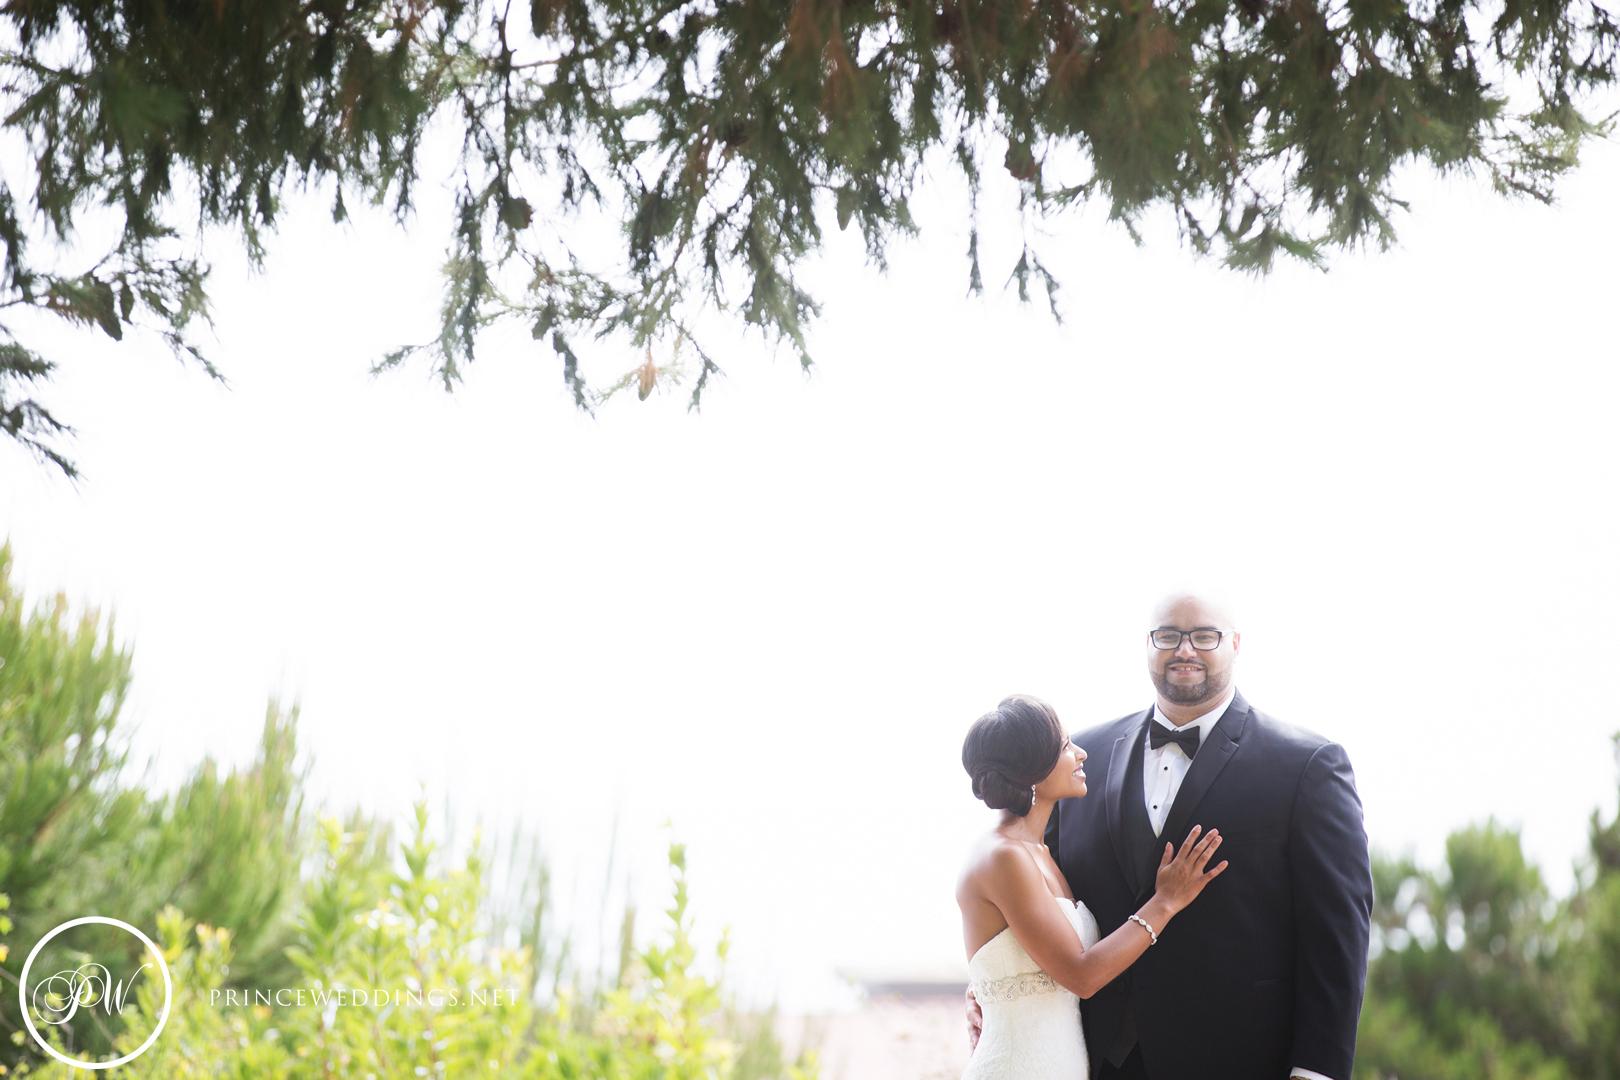 Terranea_ Resort_WeddingPhoto15.jpg